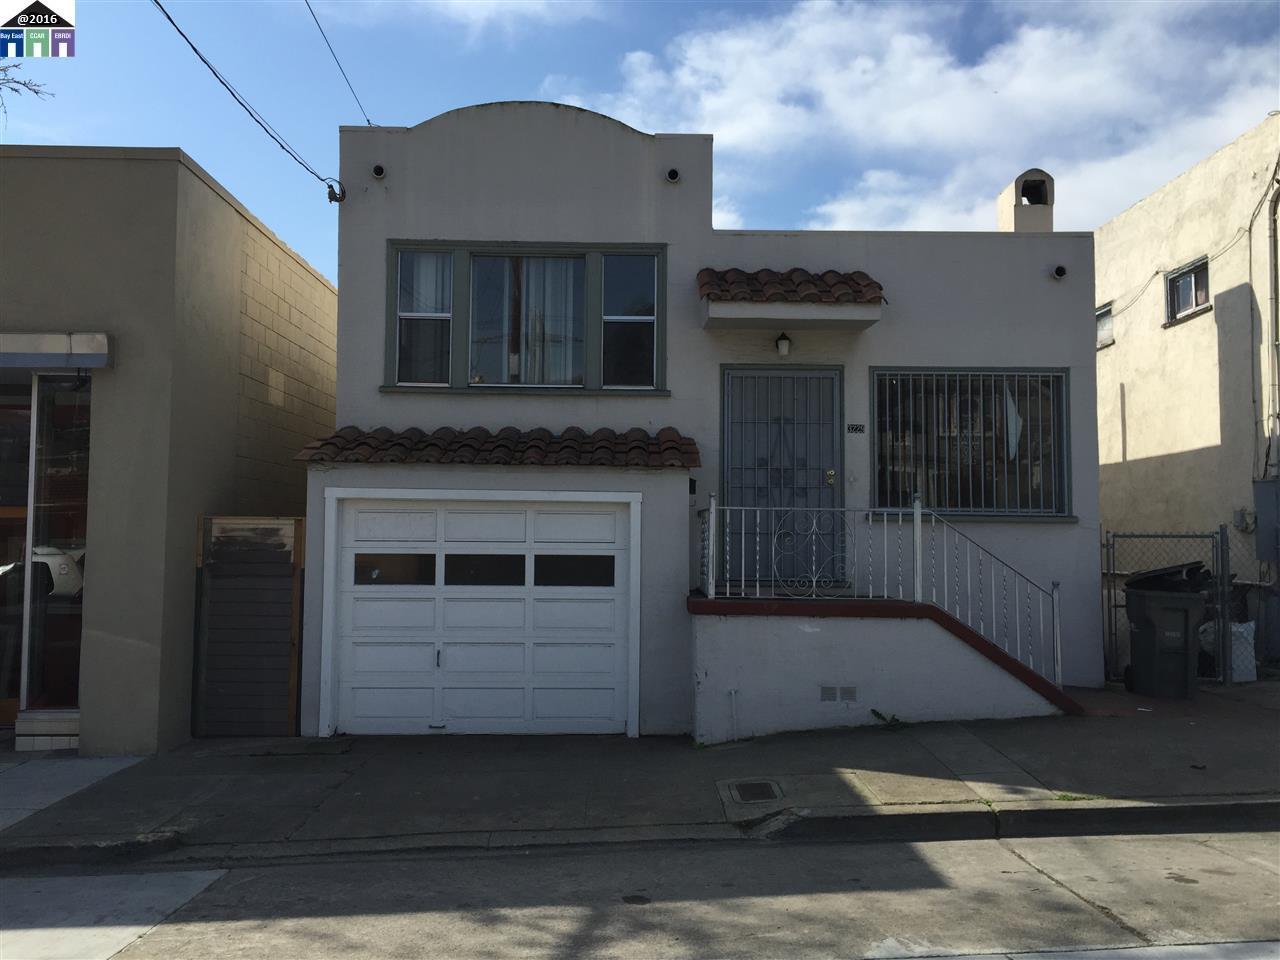 3229 Macarthur Blvd, Oakland, CA